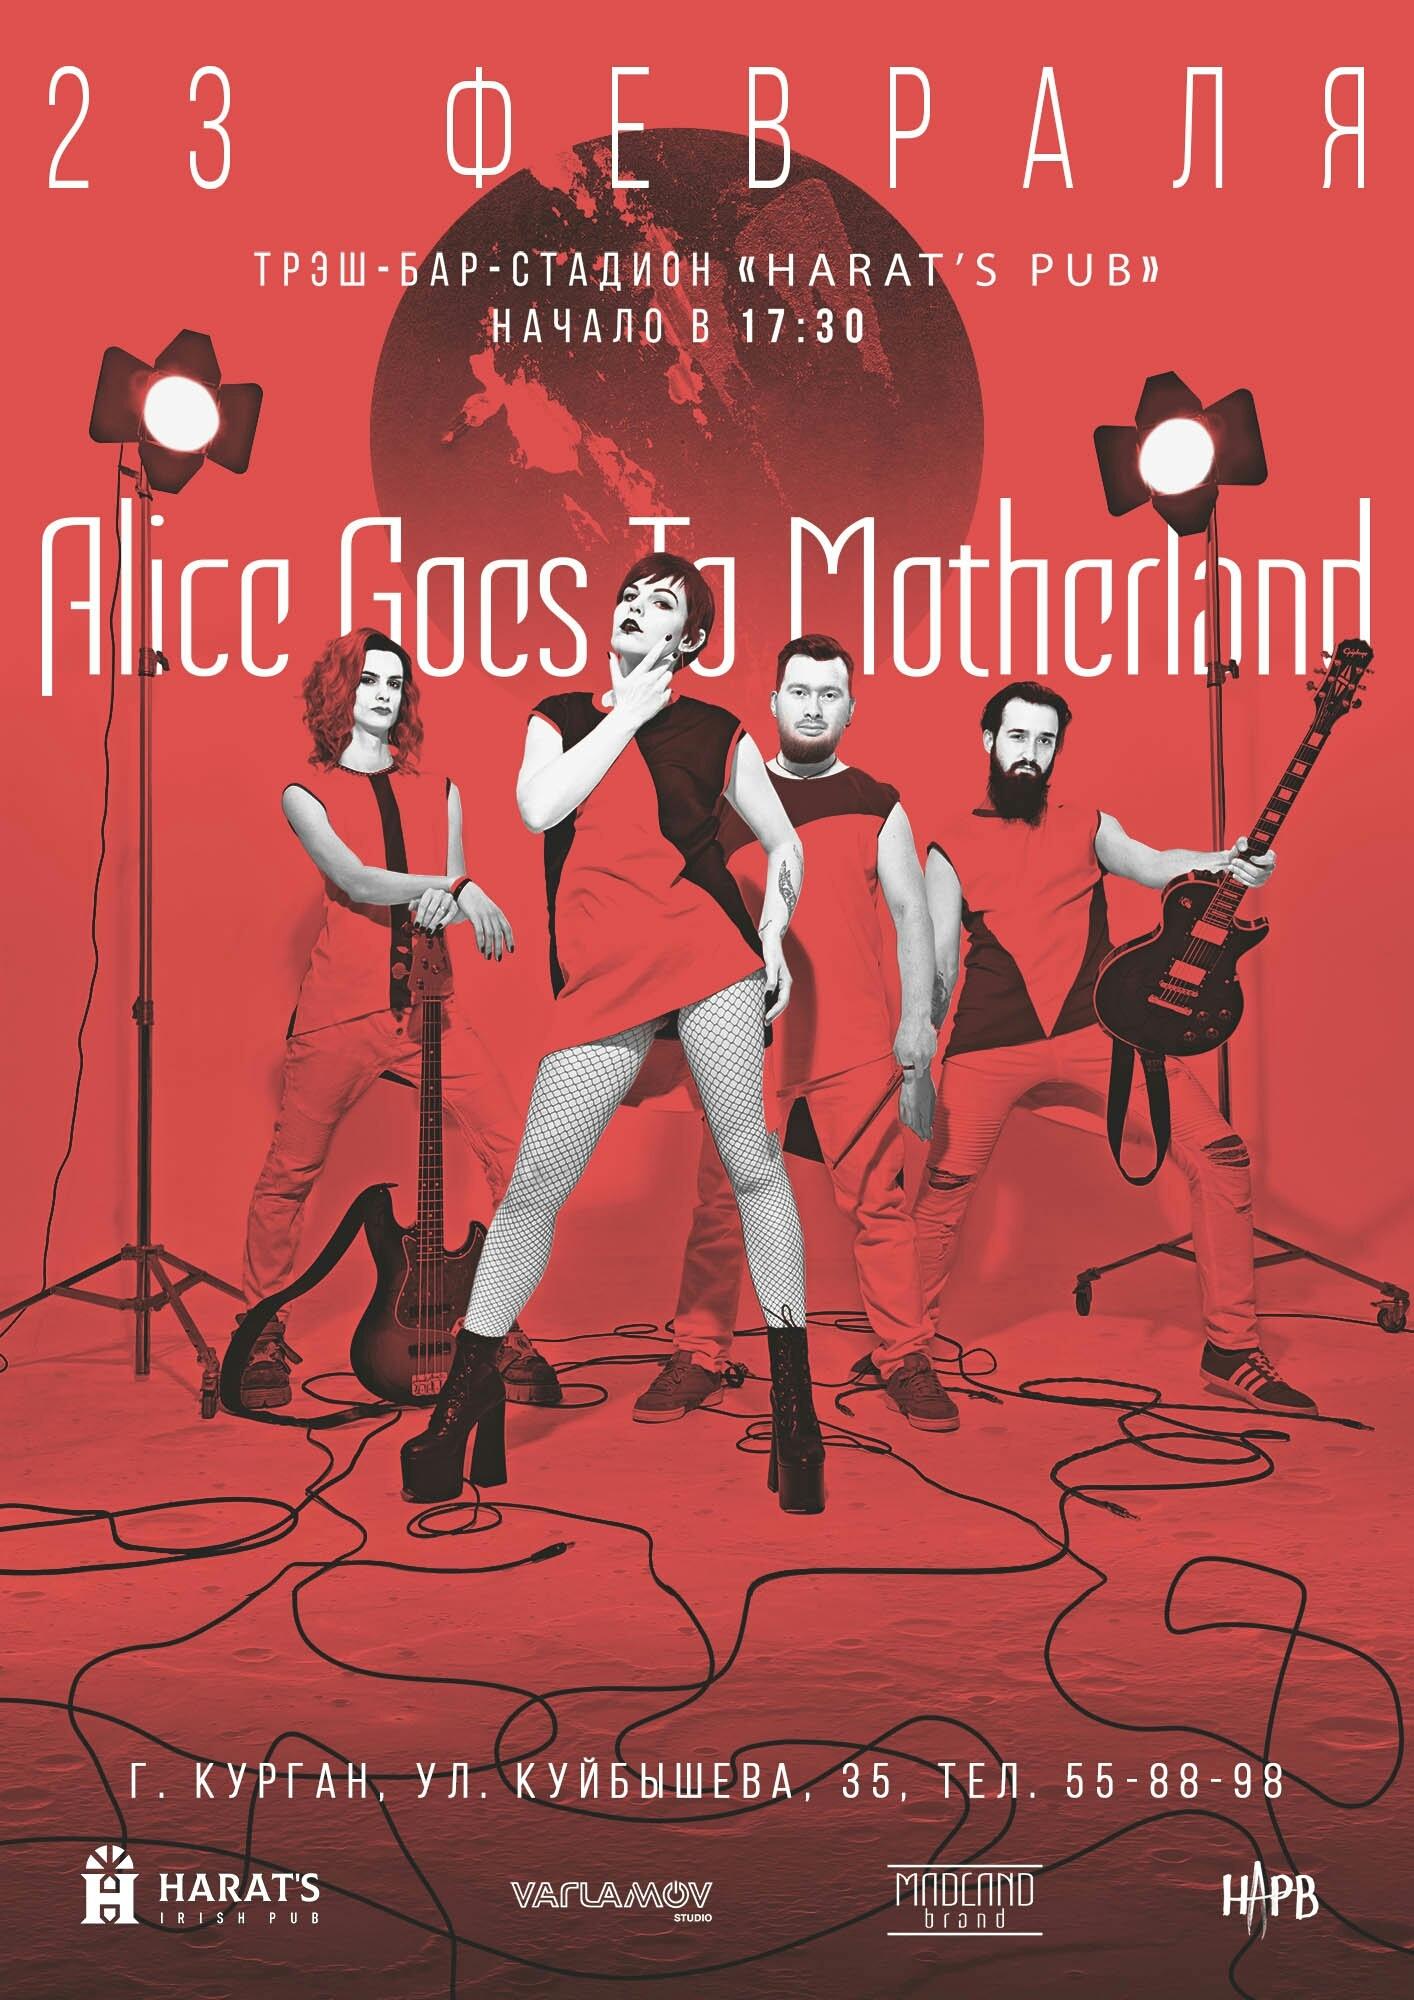 Концерт группы Alice Goes To Motherland курган афиша расписание